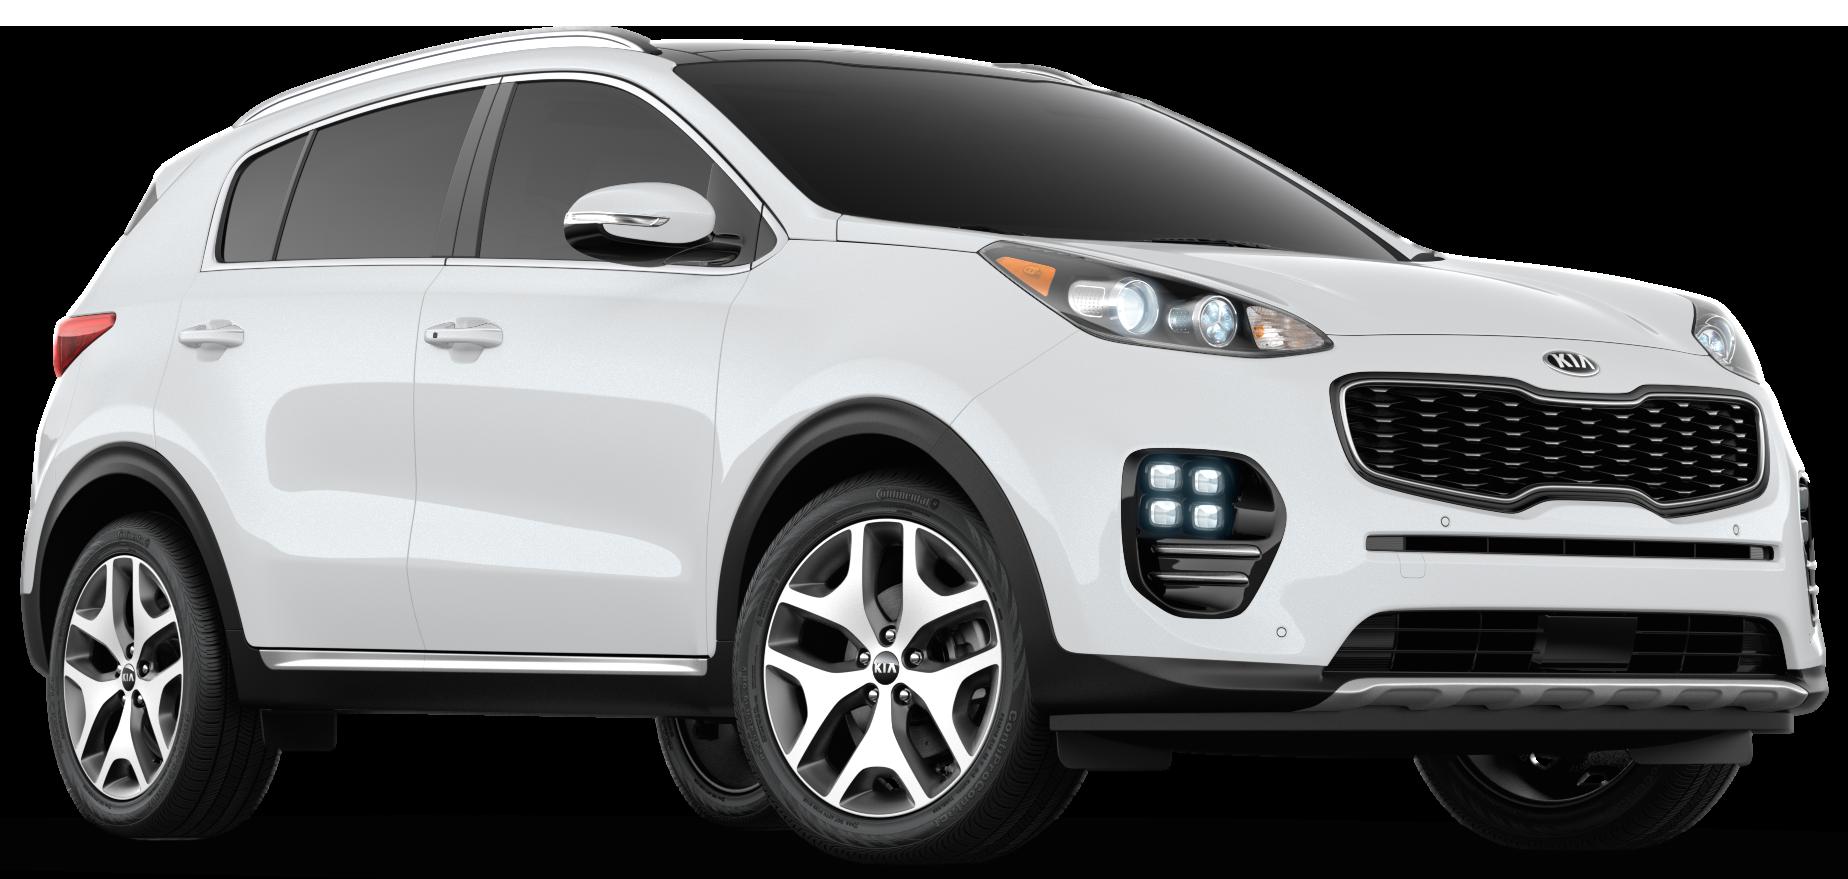 KIA cars PNG images free download, kia PNG